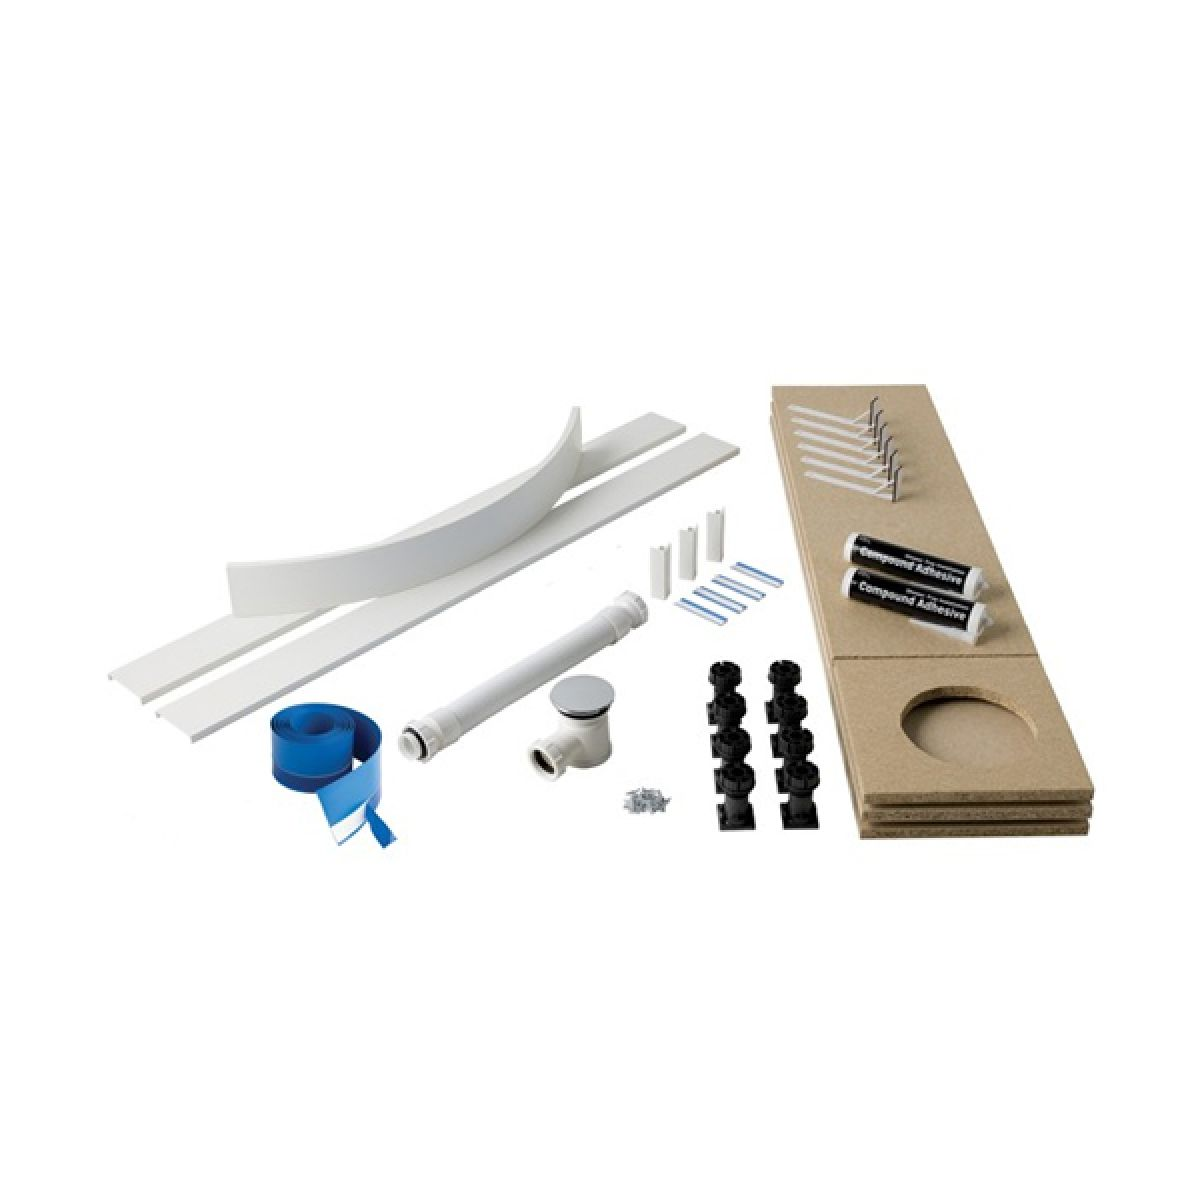 MX Universal Easy Plumb Kit for 50mm Waste